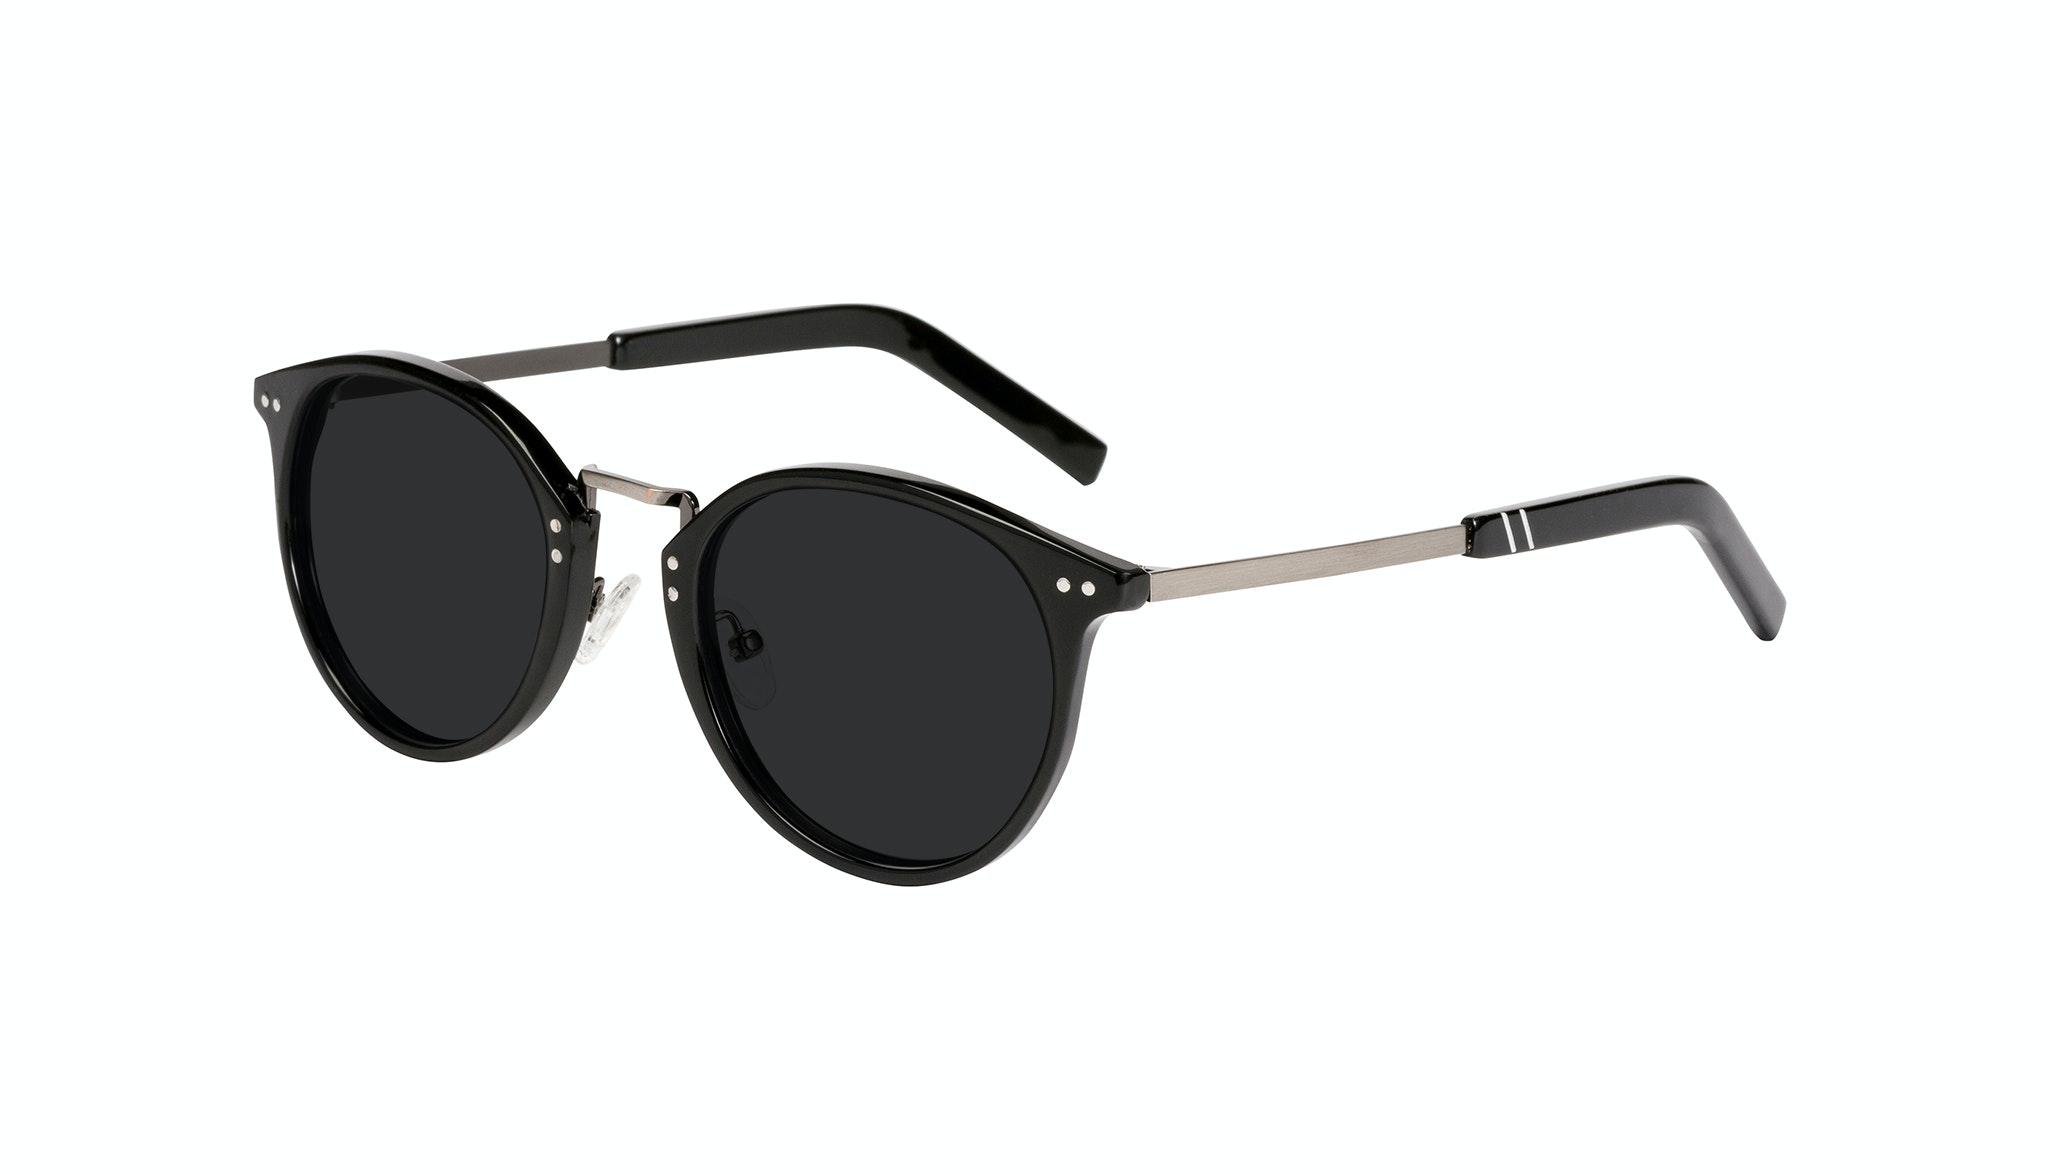 Affordable Fashion Glasses Round Sunglasses Men Truly Black Tilt